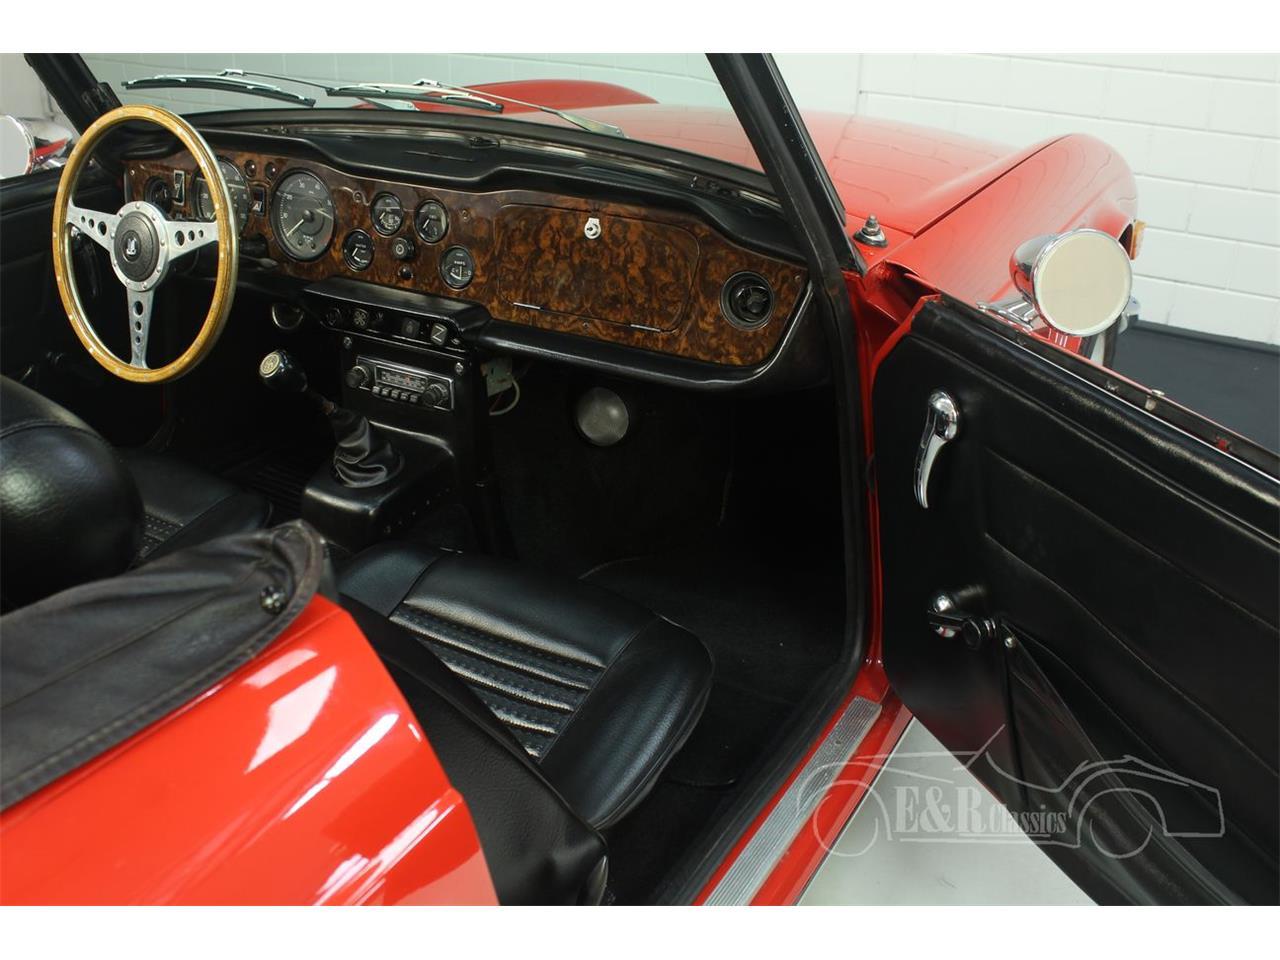 1970 Triumph TR6 (CC-1386249) for sale in Waalwijk, Noord-Brabant